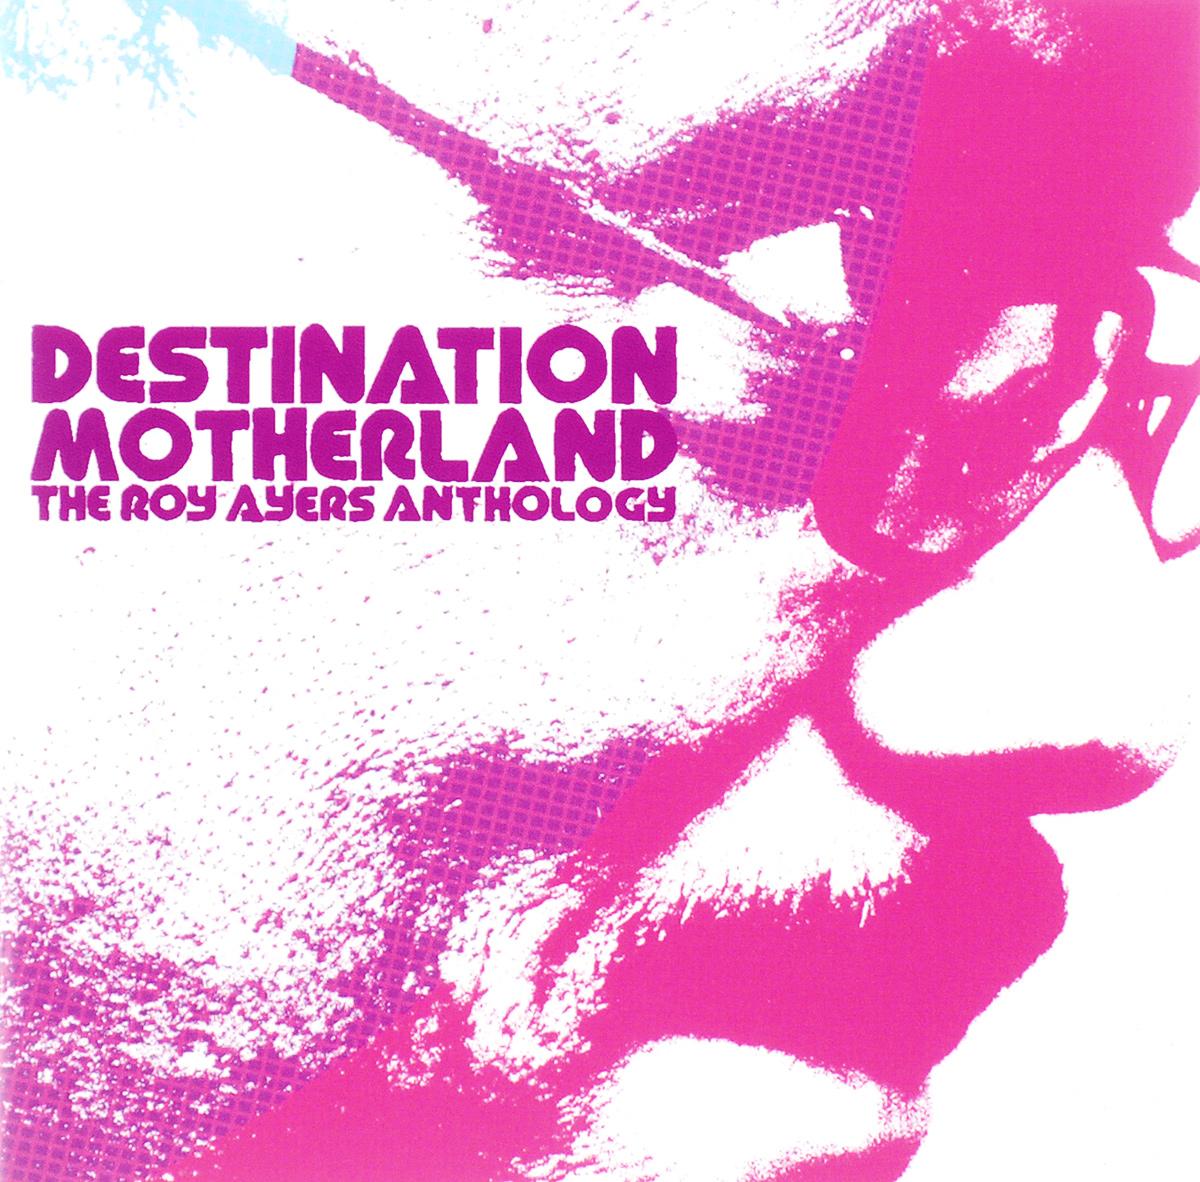 Рой Эйрс Roy Ayers. Destination Motherland: The Anthology (2 CD) рой орбисон хэнк уильямс старший roy orbison the mgm years 13 cd